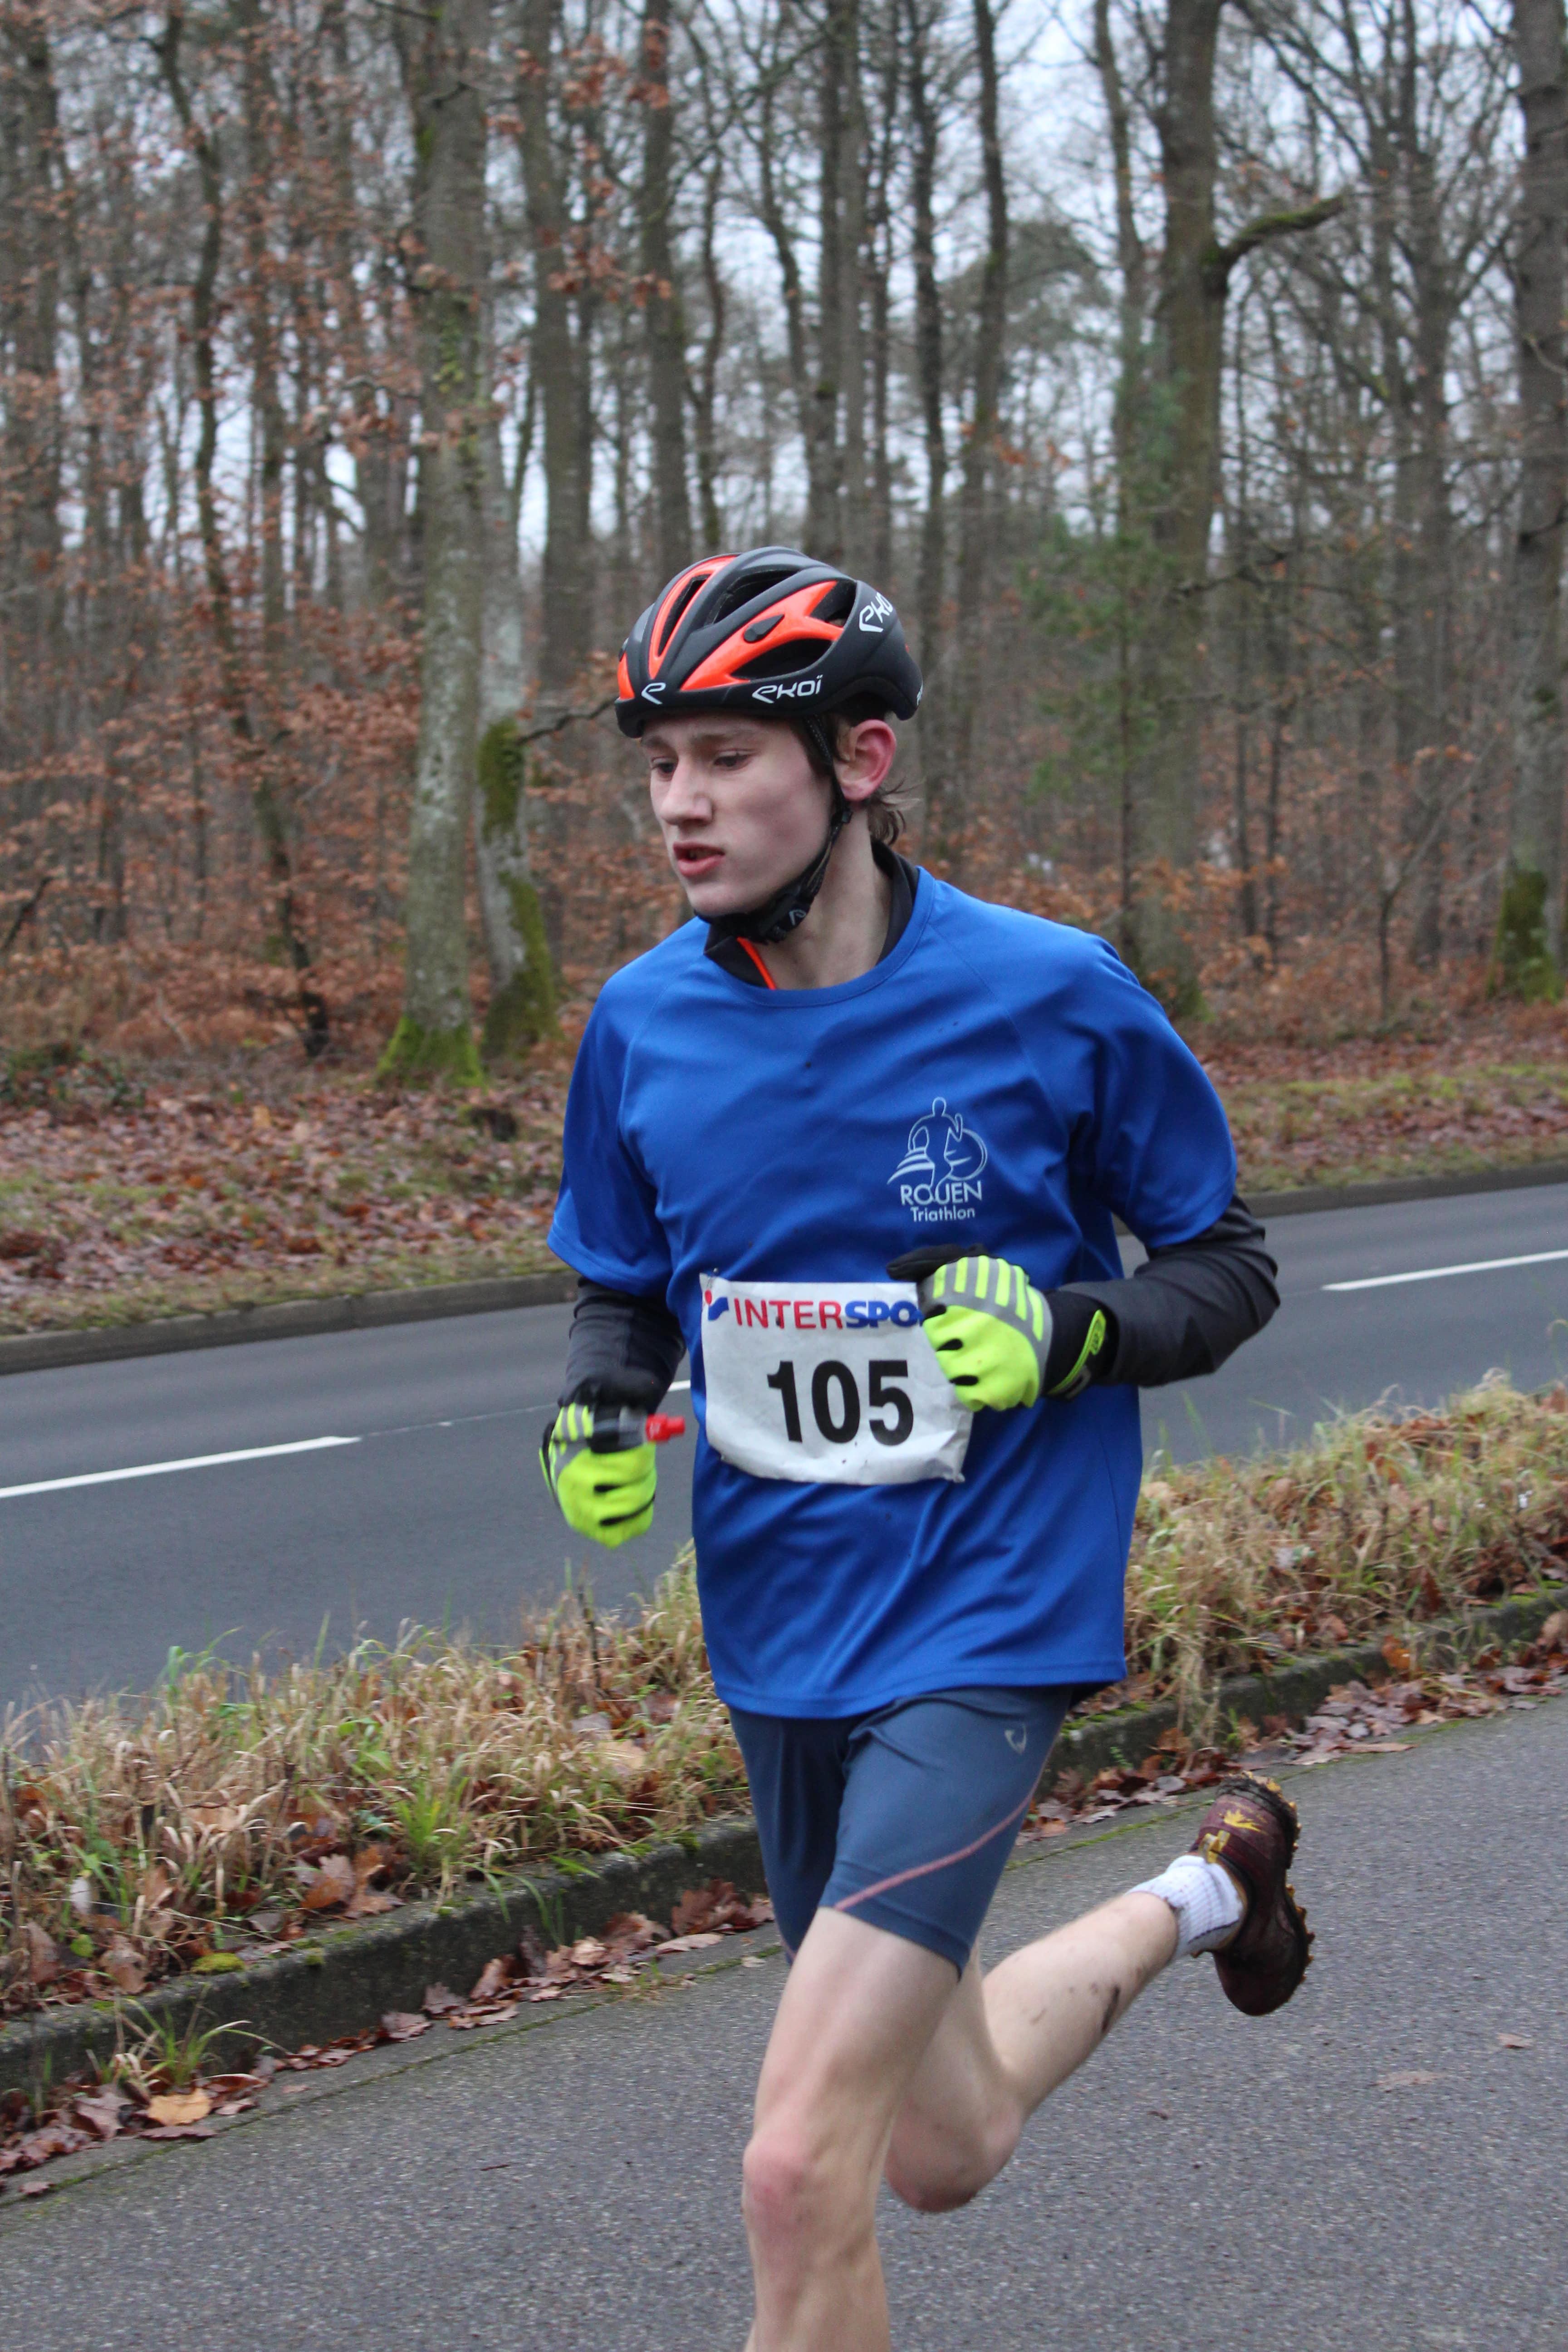 bike and run 20.01.2019 065 min